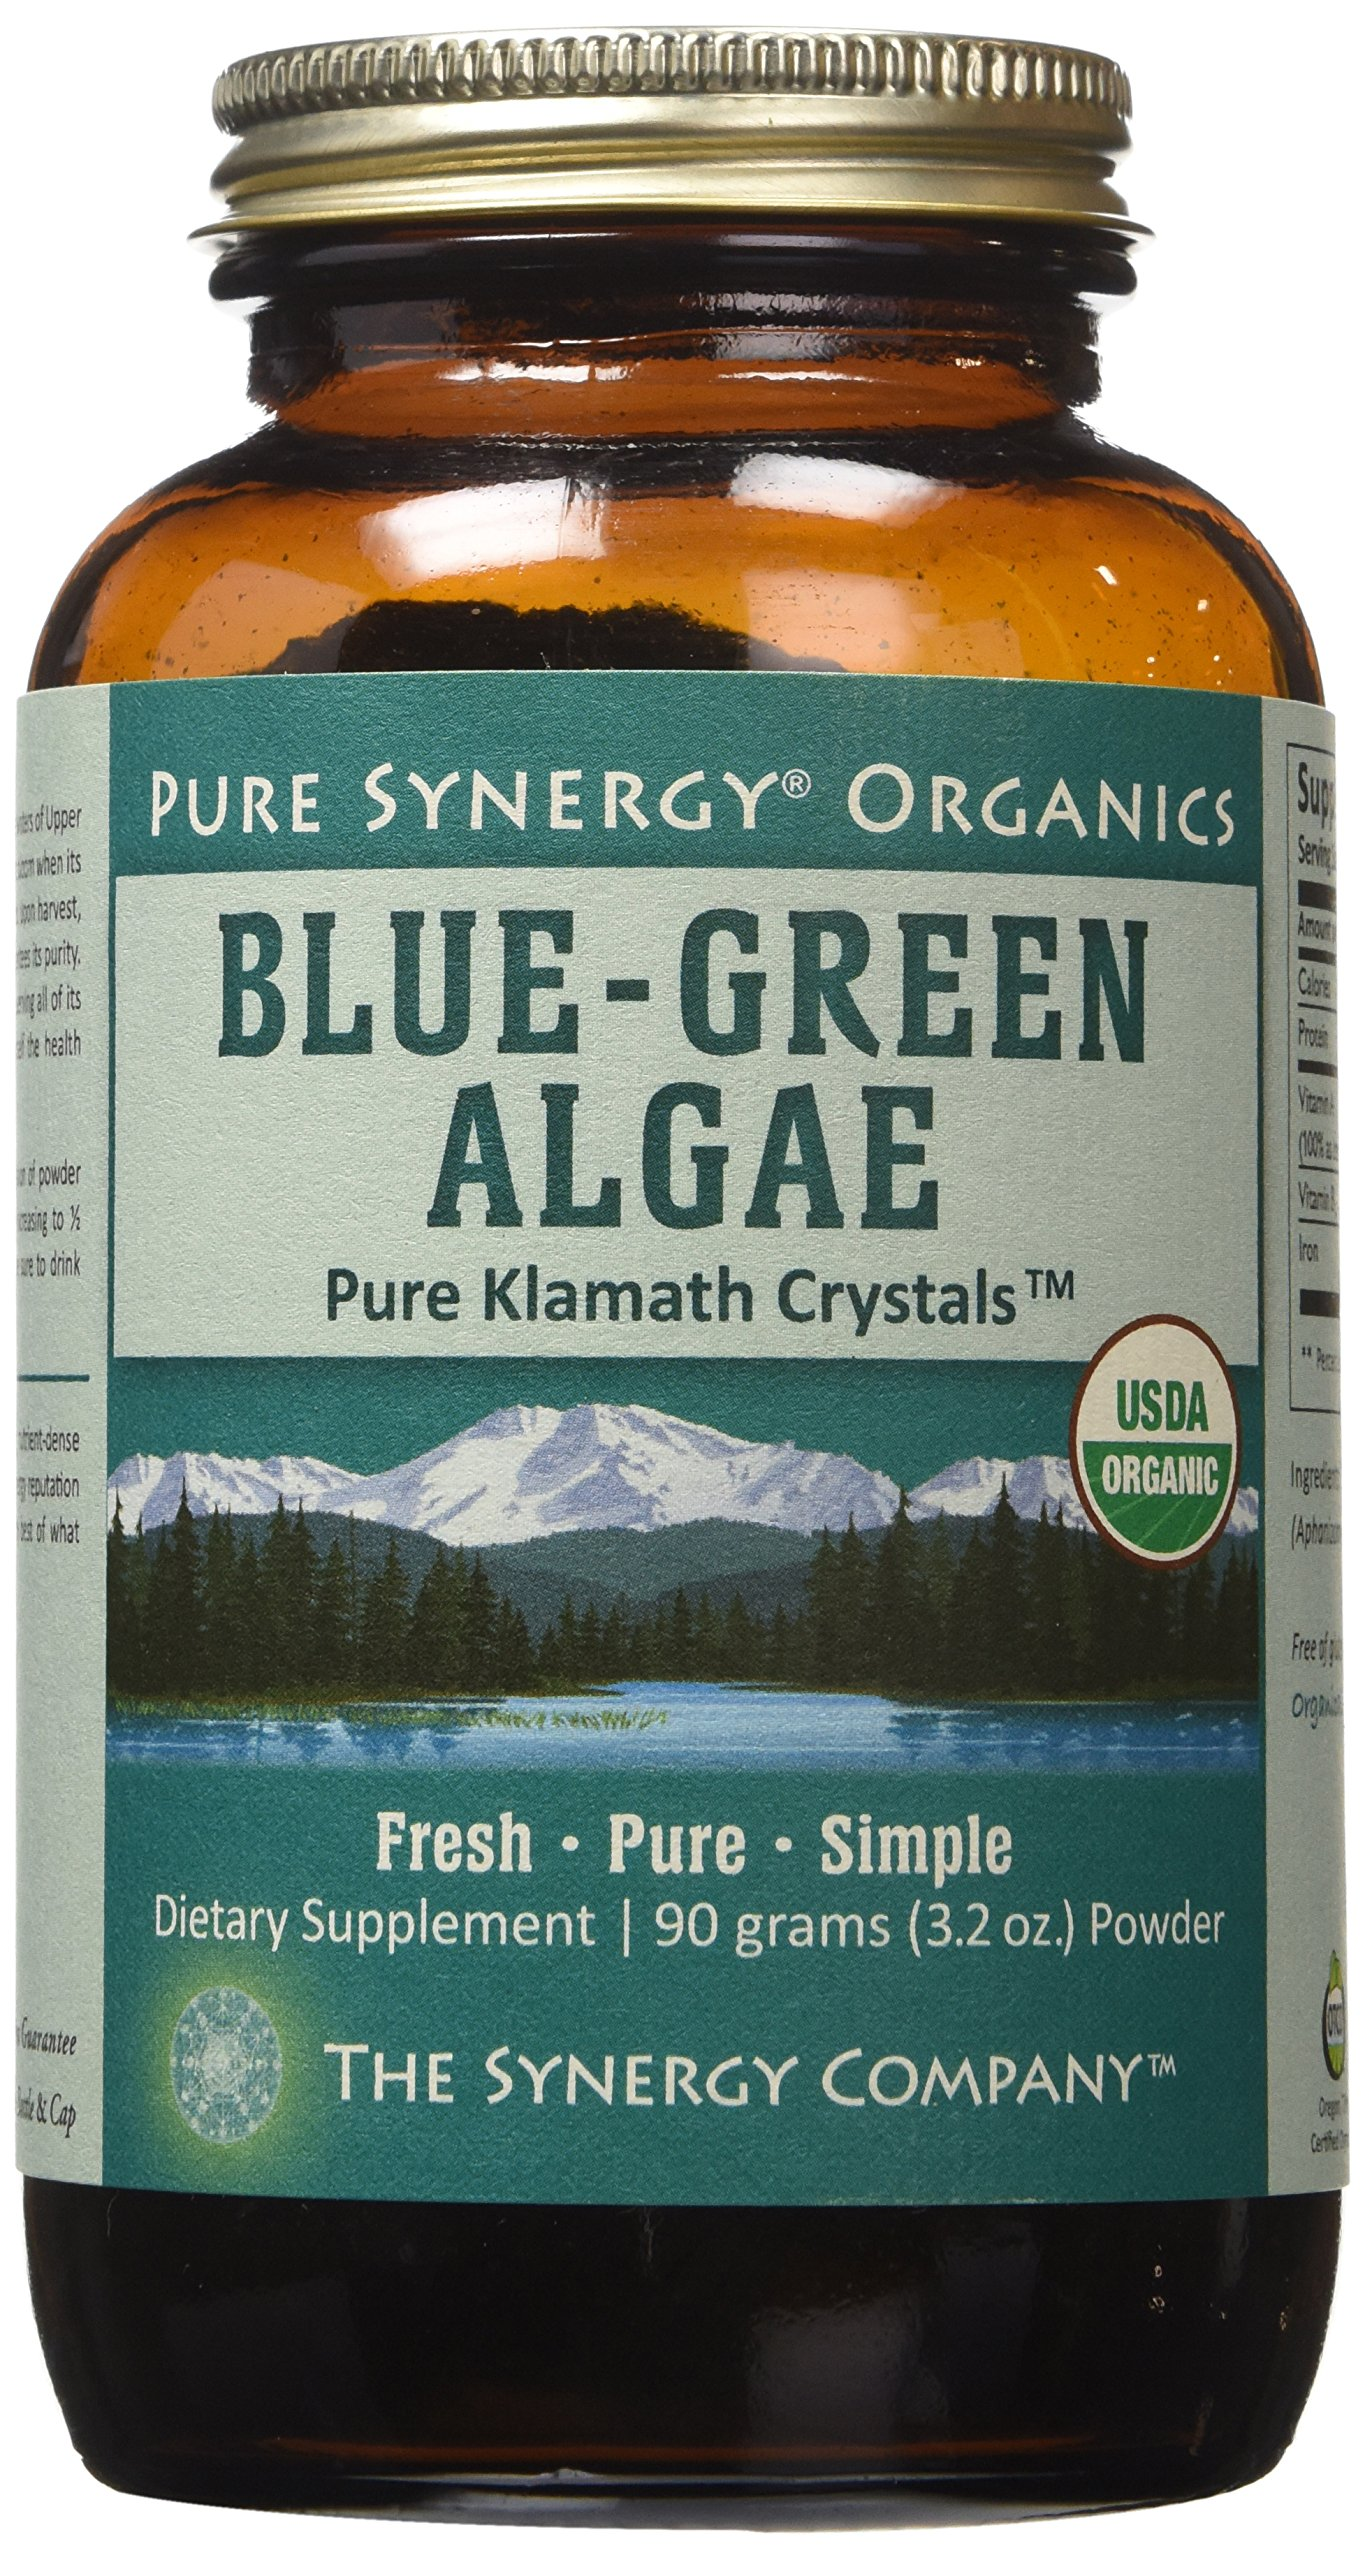 Pure Synergy USDA Organic Klamath Blue Green Algae Powder (3.2 oz) Fully Tested, Non-GMO by Pure Synergy (Image #2)